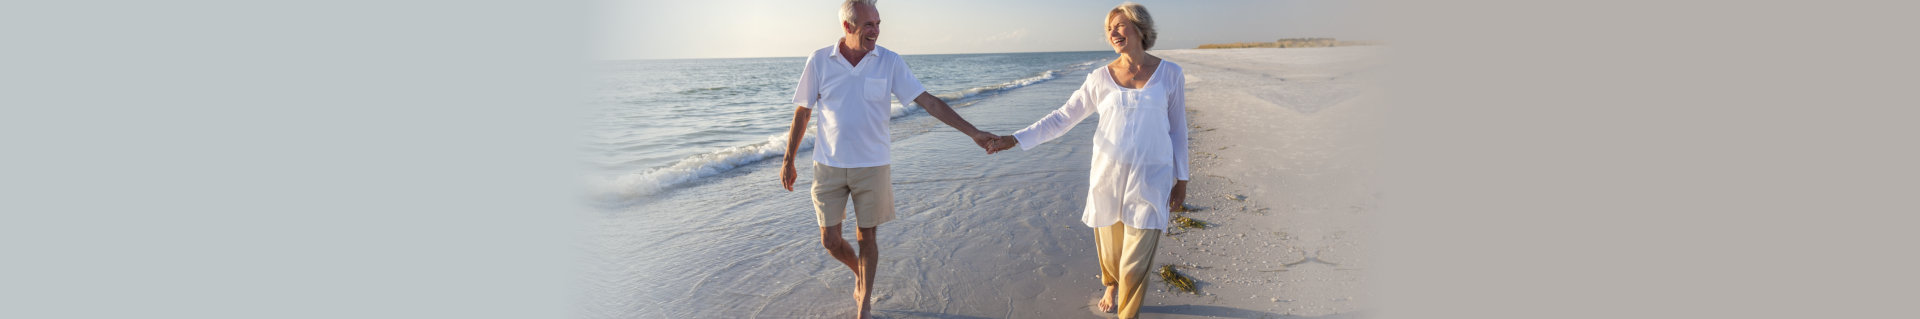 couple senior walking at beach